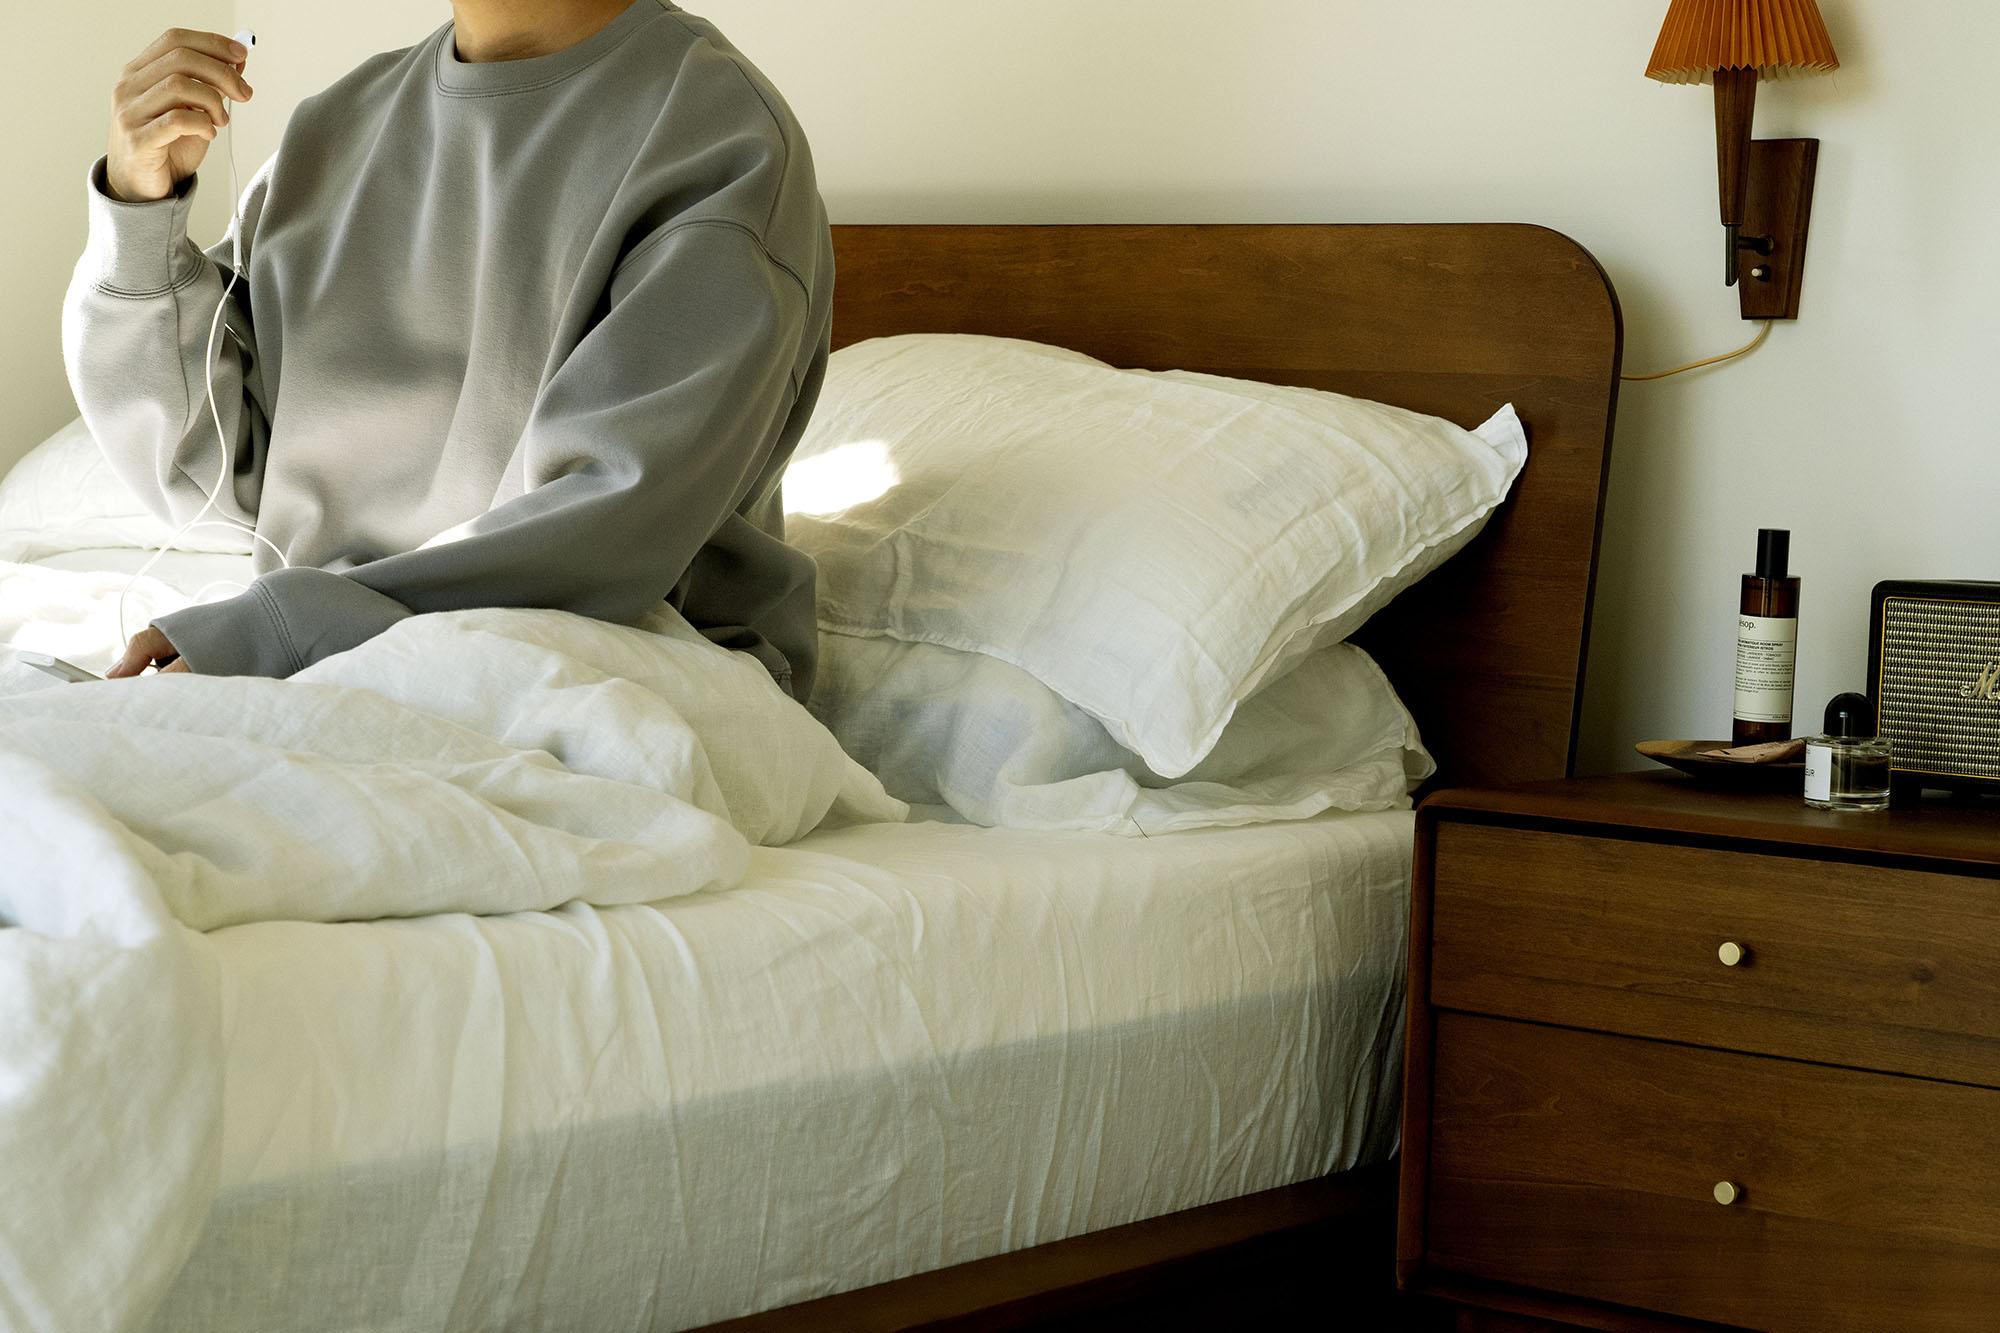 MR. LIVING 居家先生 床墊|讓家每天都像入住喜歡的飯店一樣開心舒適 @MENS 30S LIFE